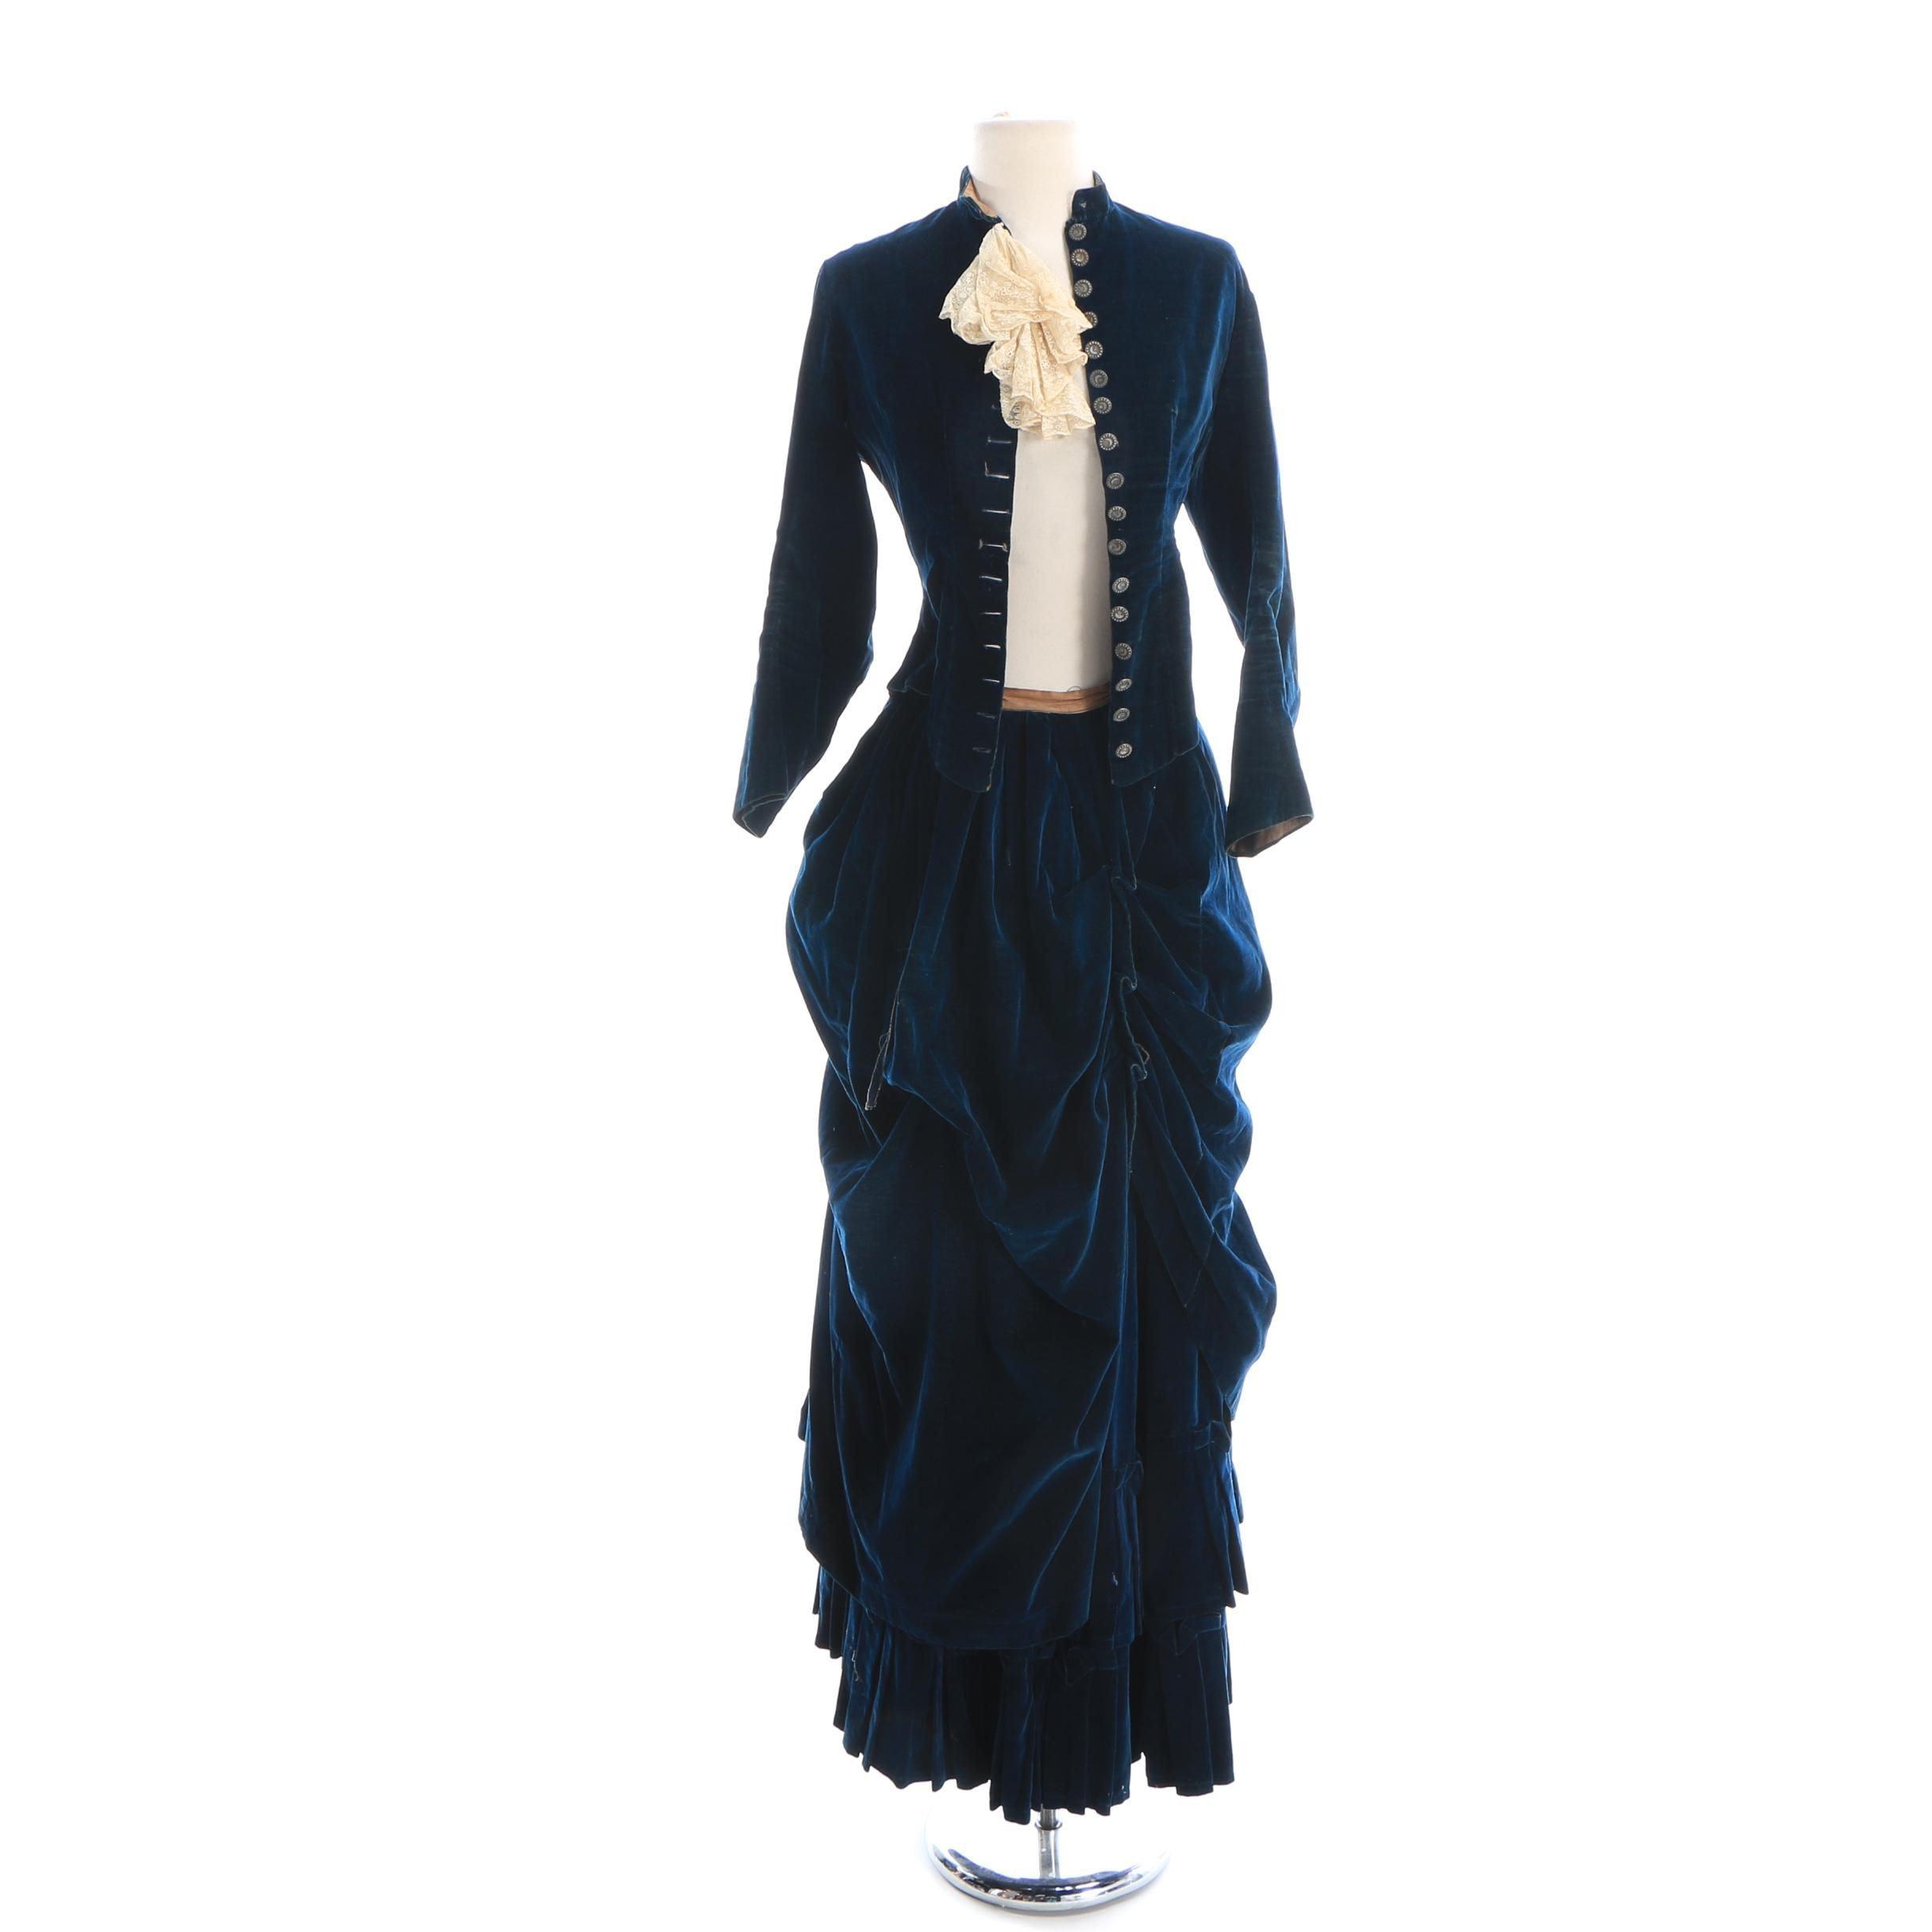 Circa 1880s Reproduction Midnight Blue Velveteen Riding Habit